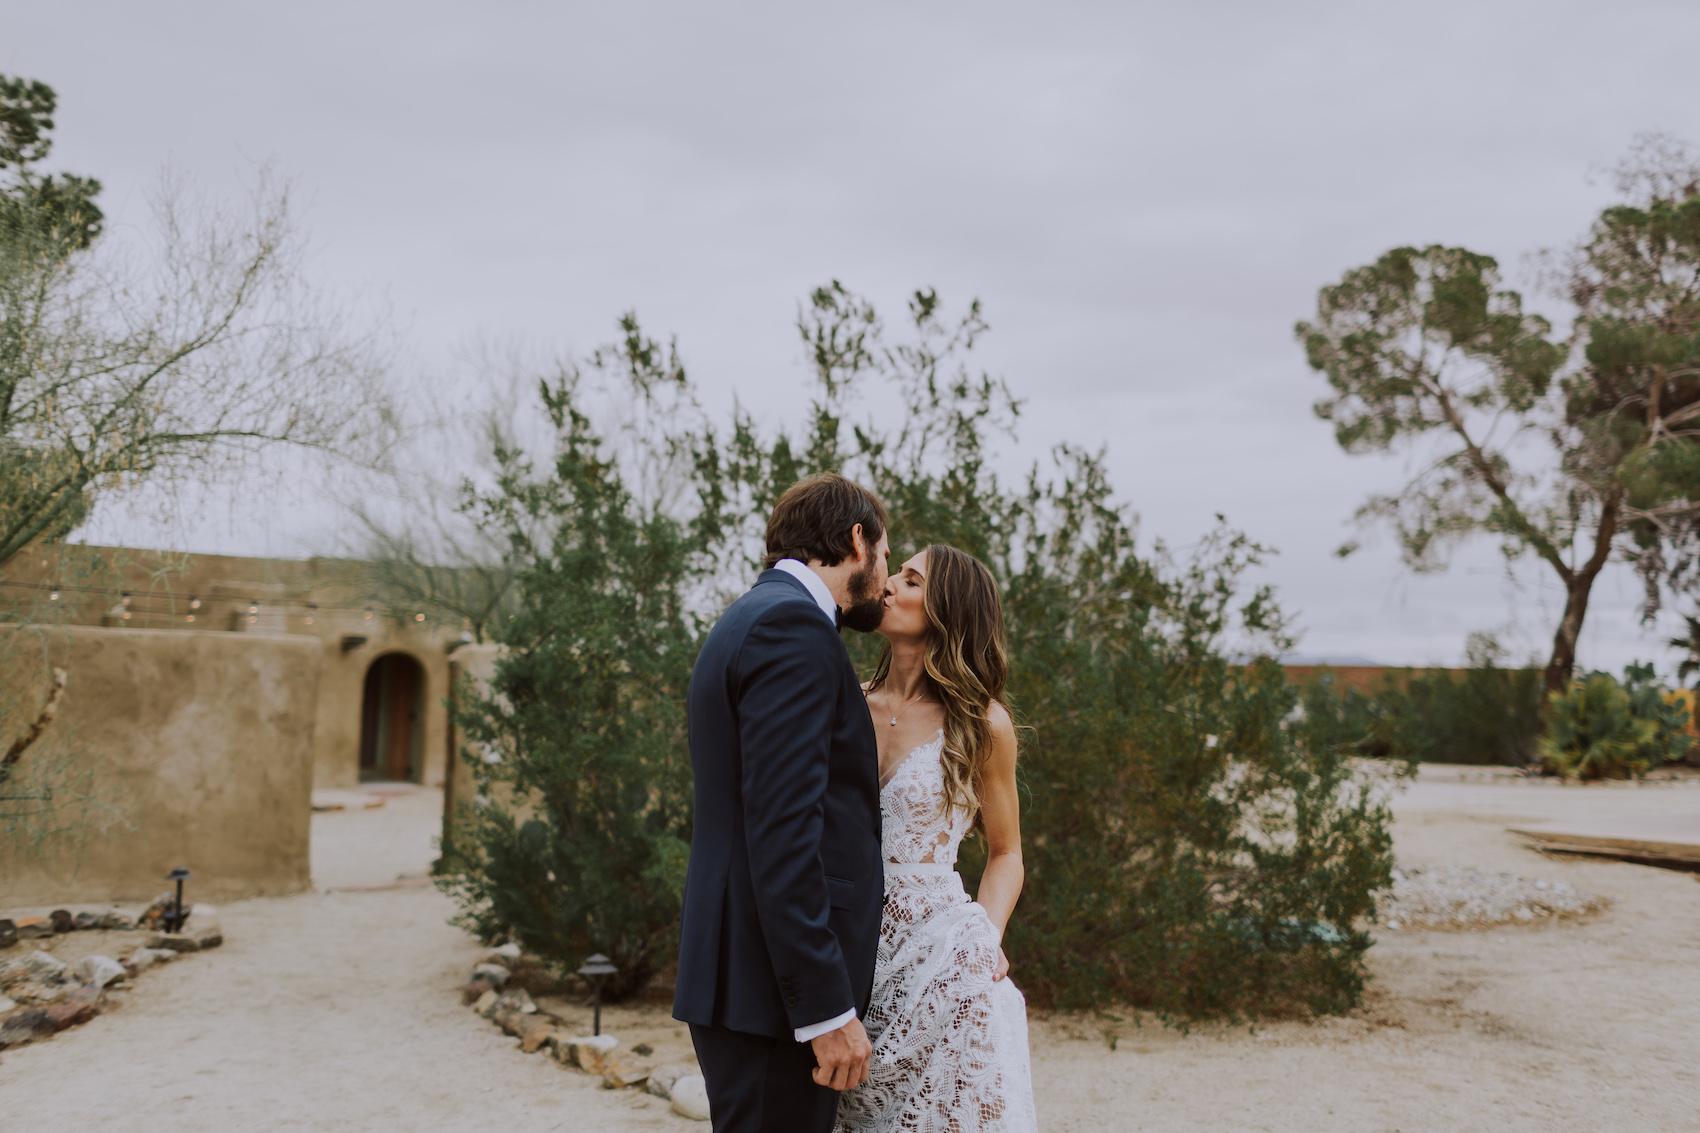 29-Palms-Inn-Joshua-Tree-Jewish-Wedding-H+M-25.jpg